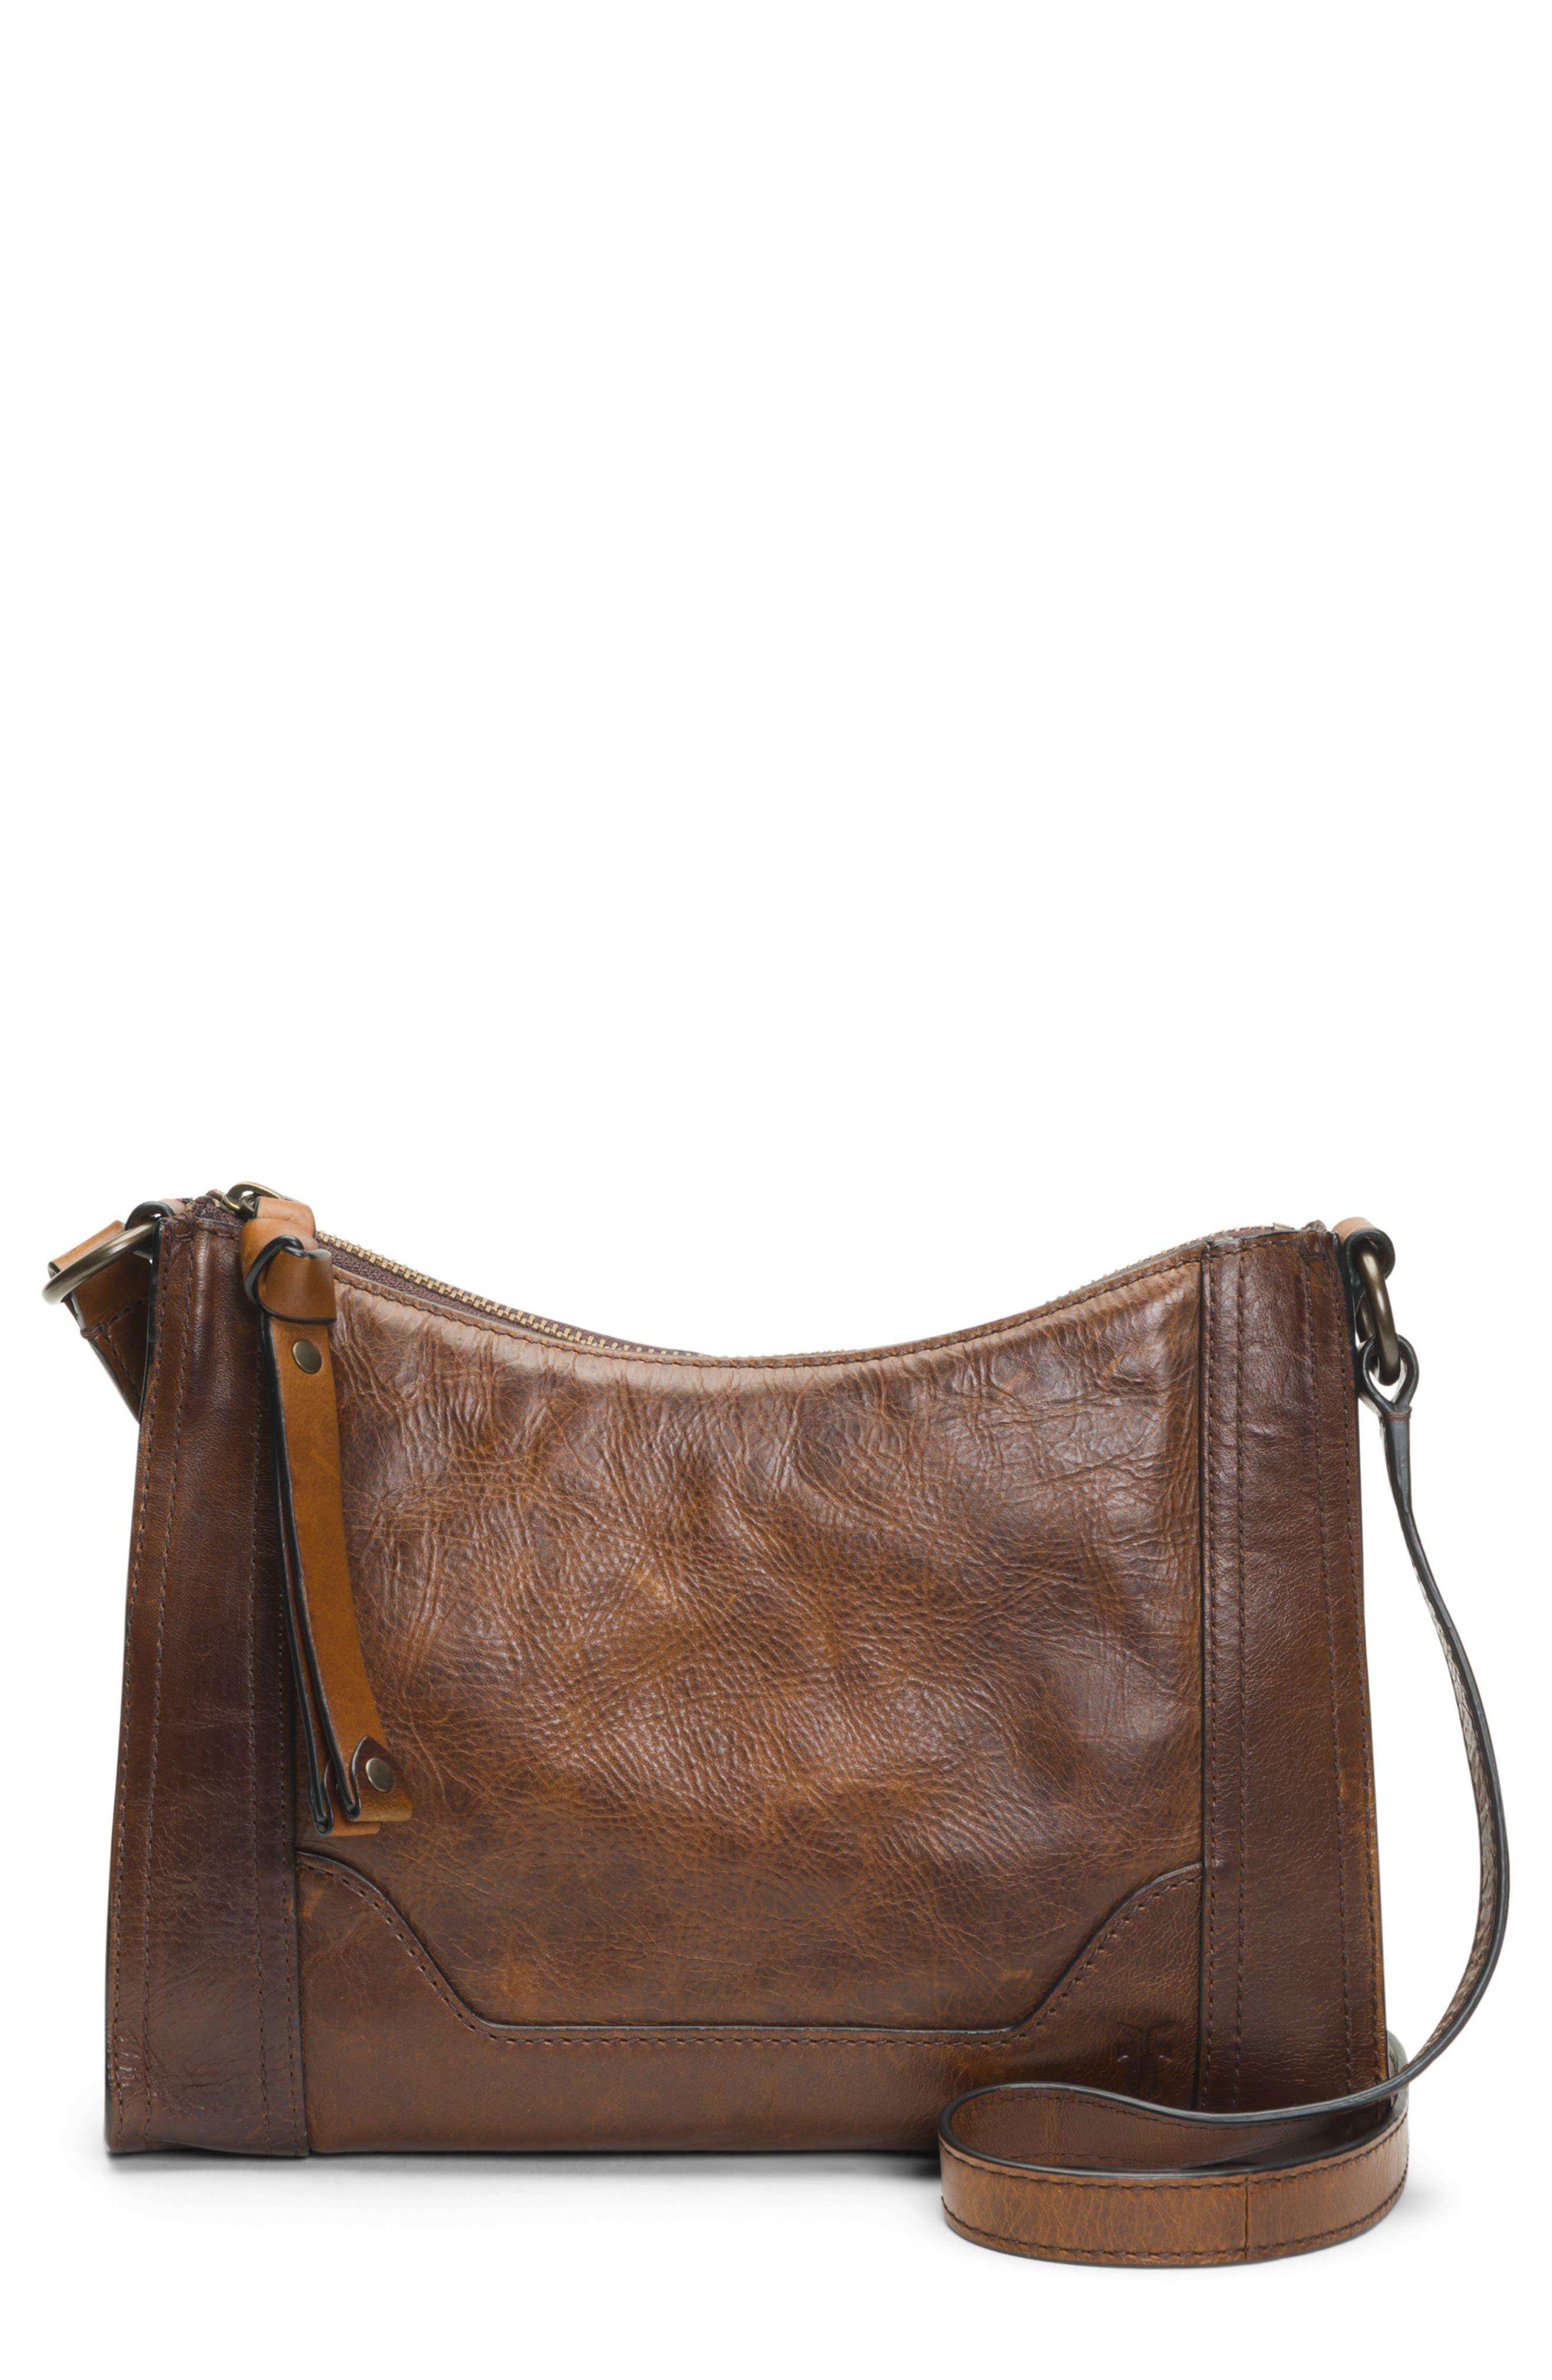 Melissa Leather Crossbody Bag,                         Main,                         color, DARK BROWN